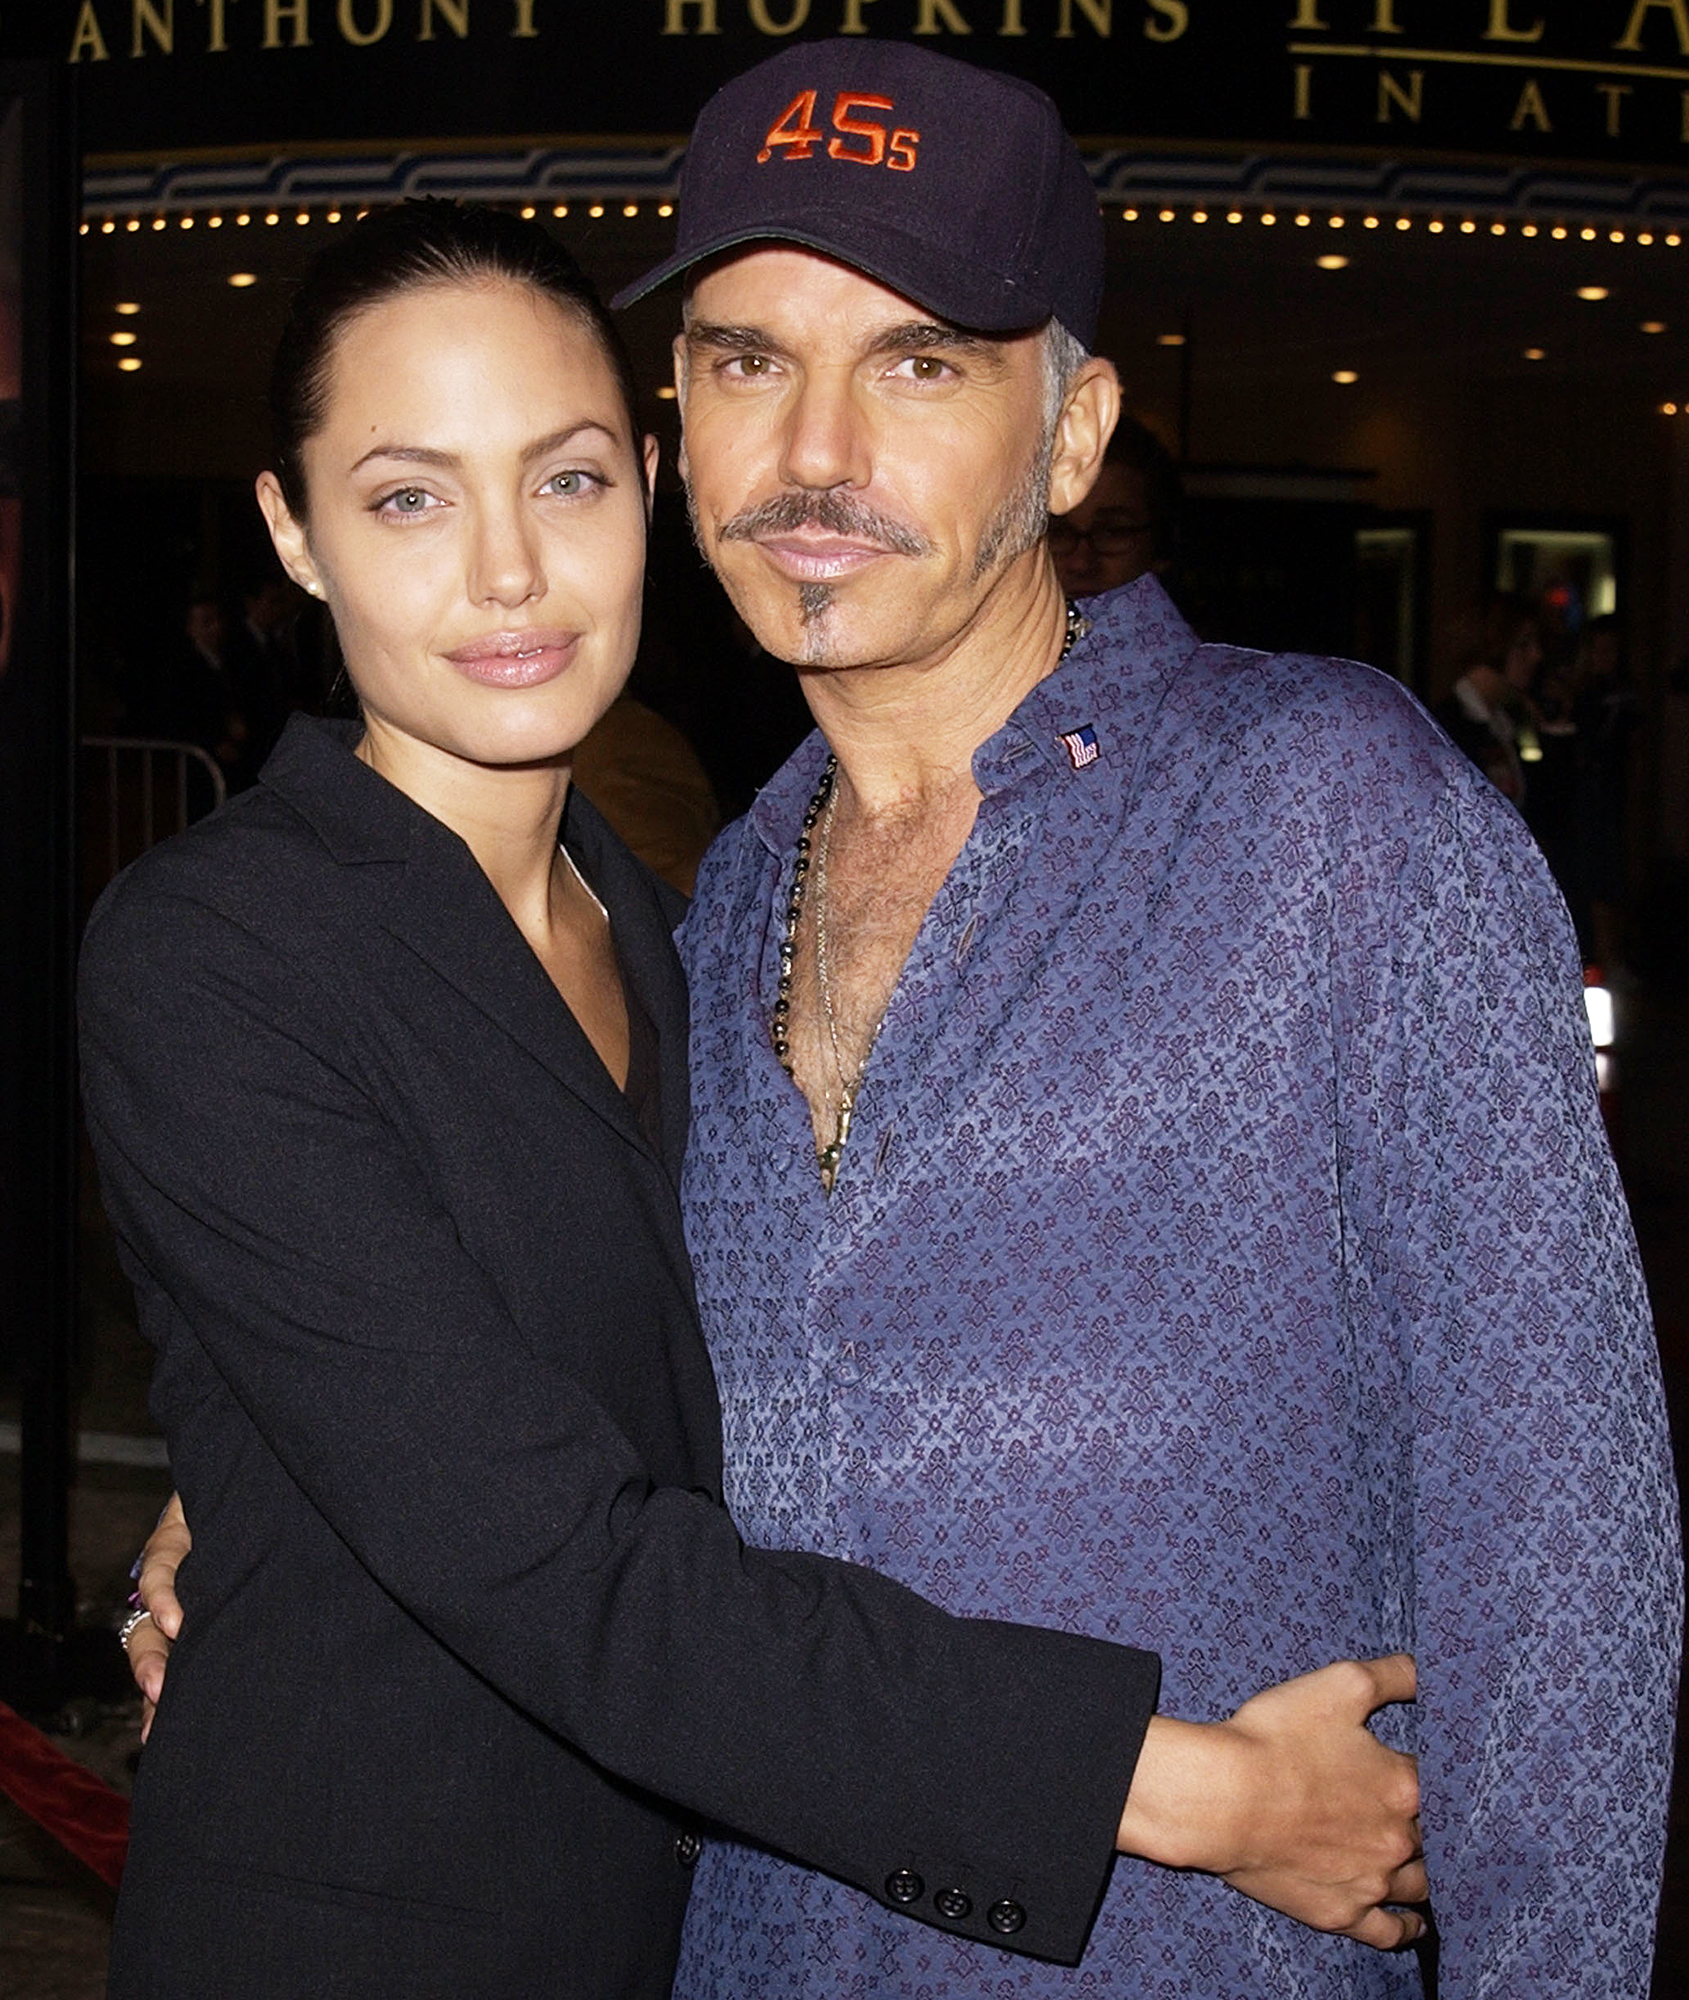 Angelina Jolie Billy Bob Thornton Still Friends